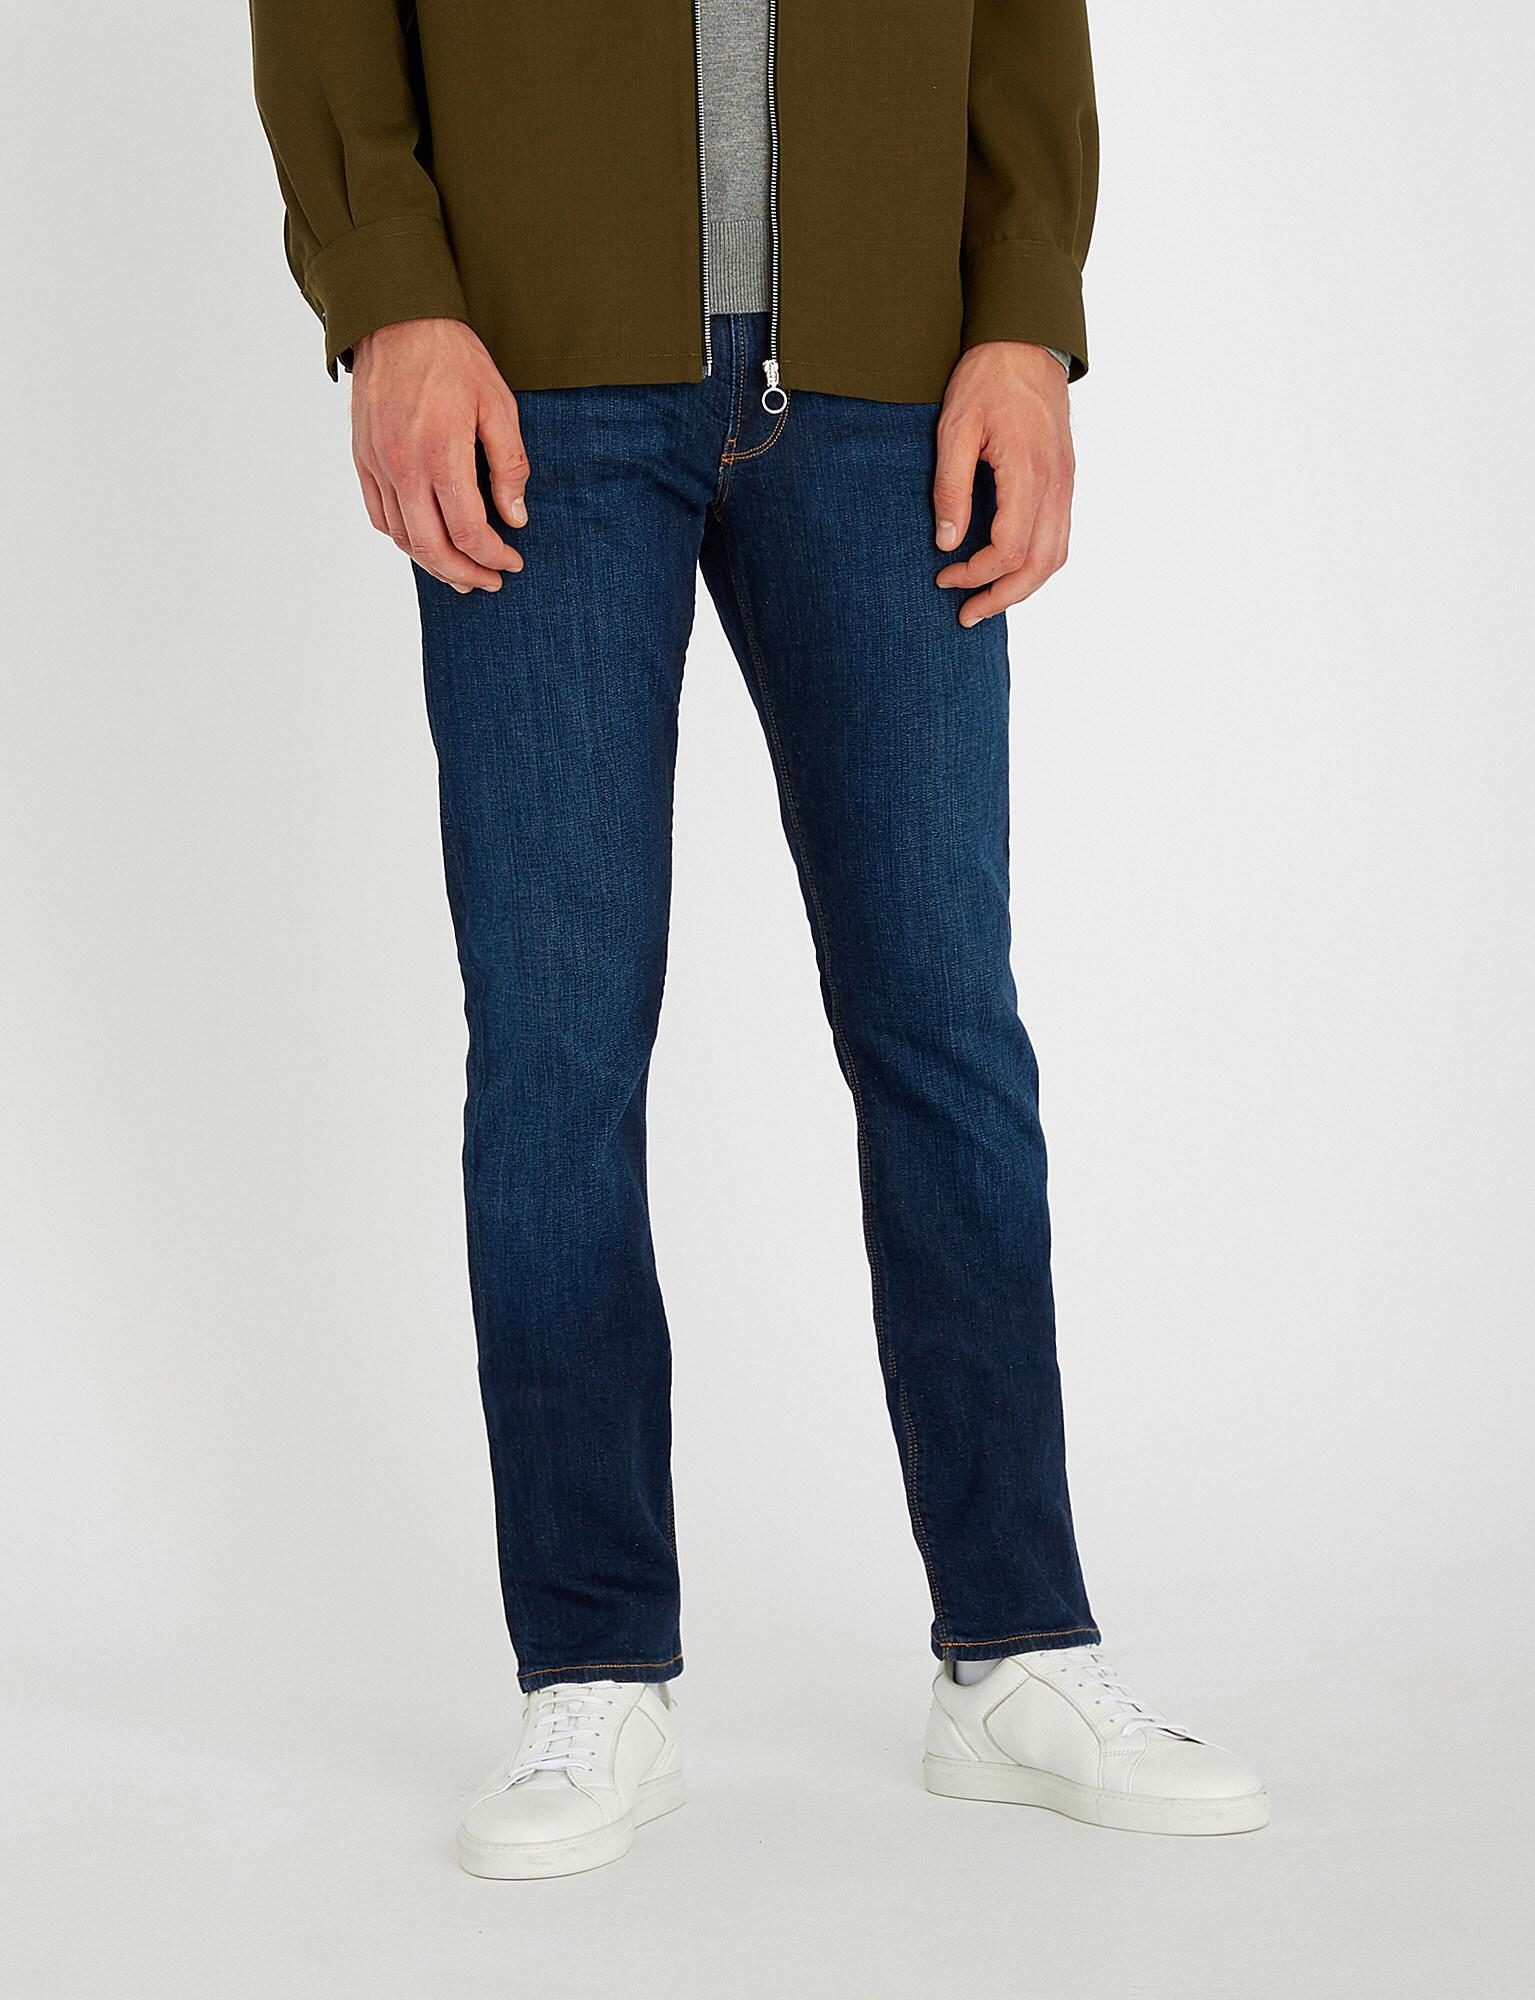 71bb2dbadf1ff Lyst - Emporio Armani J06 Slim-fit Skinny Jeans in Blue for Men